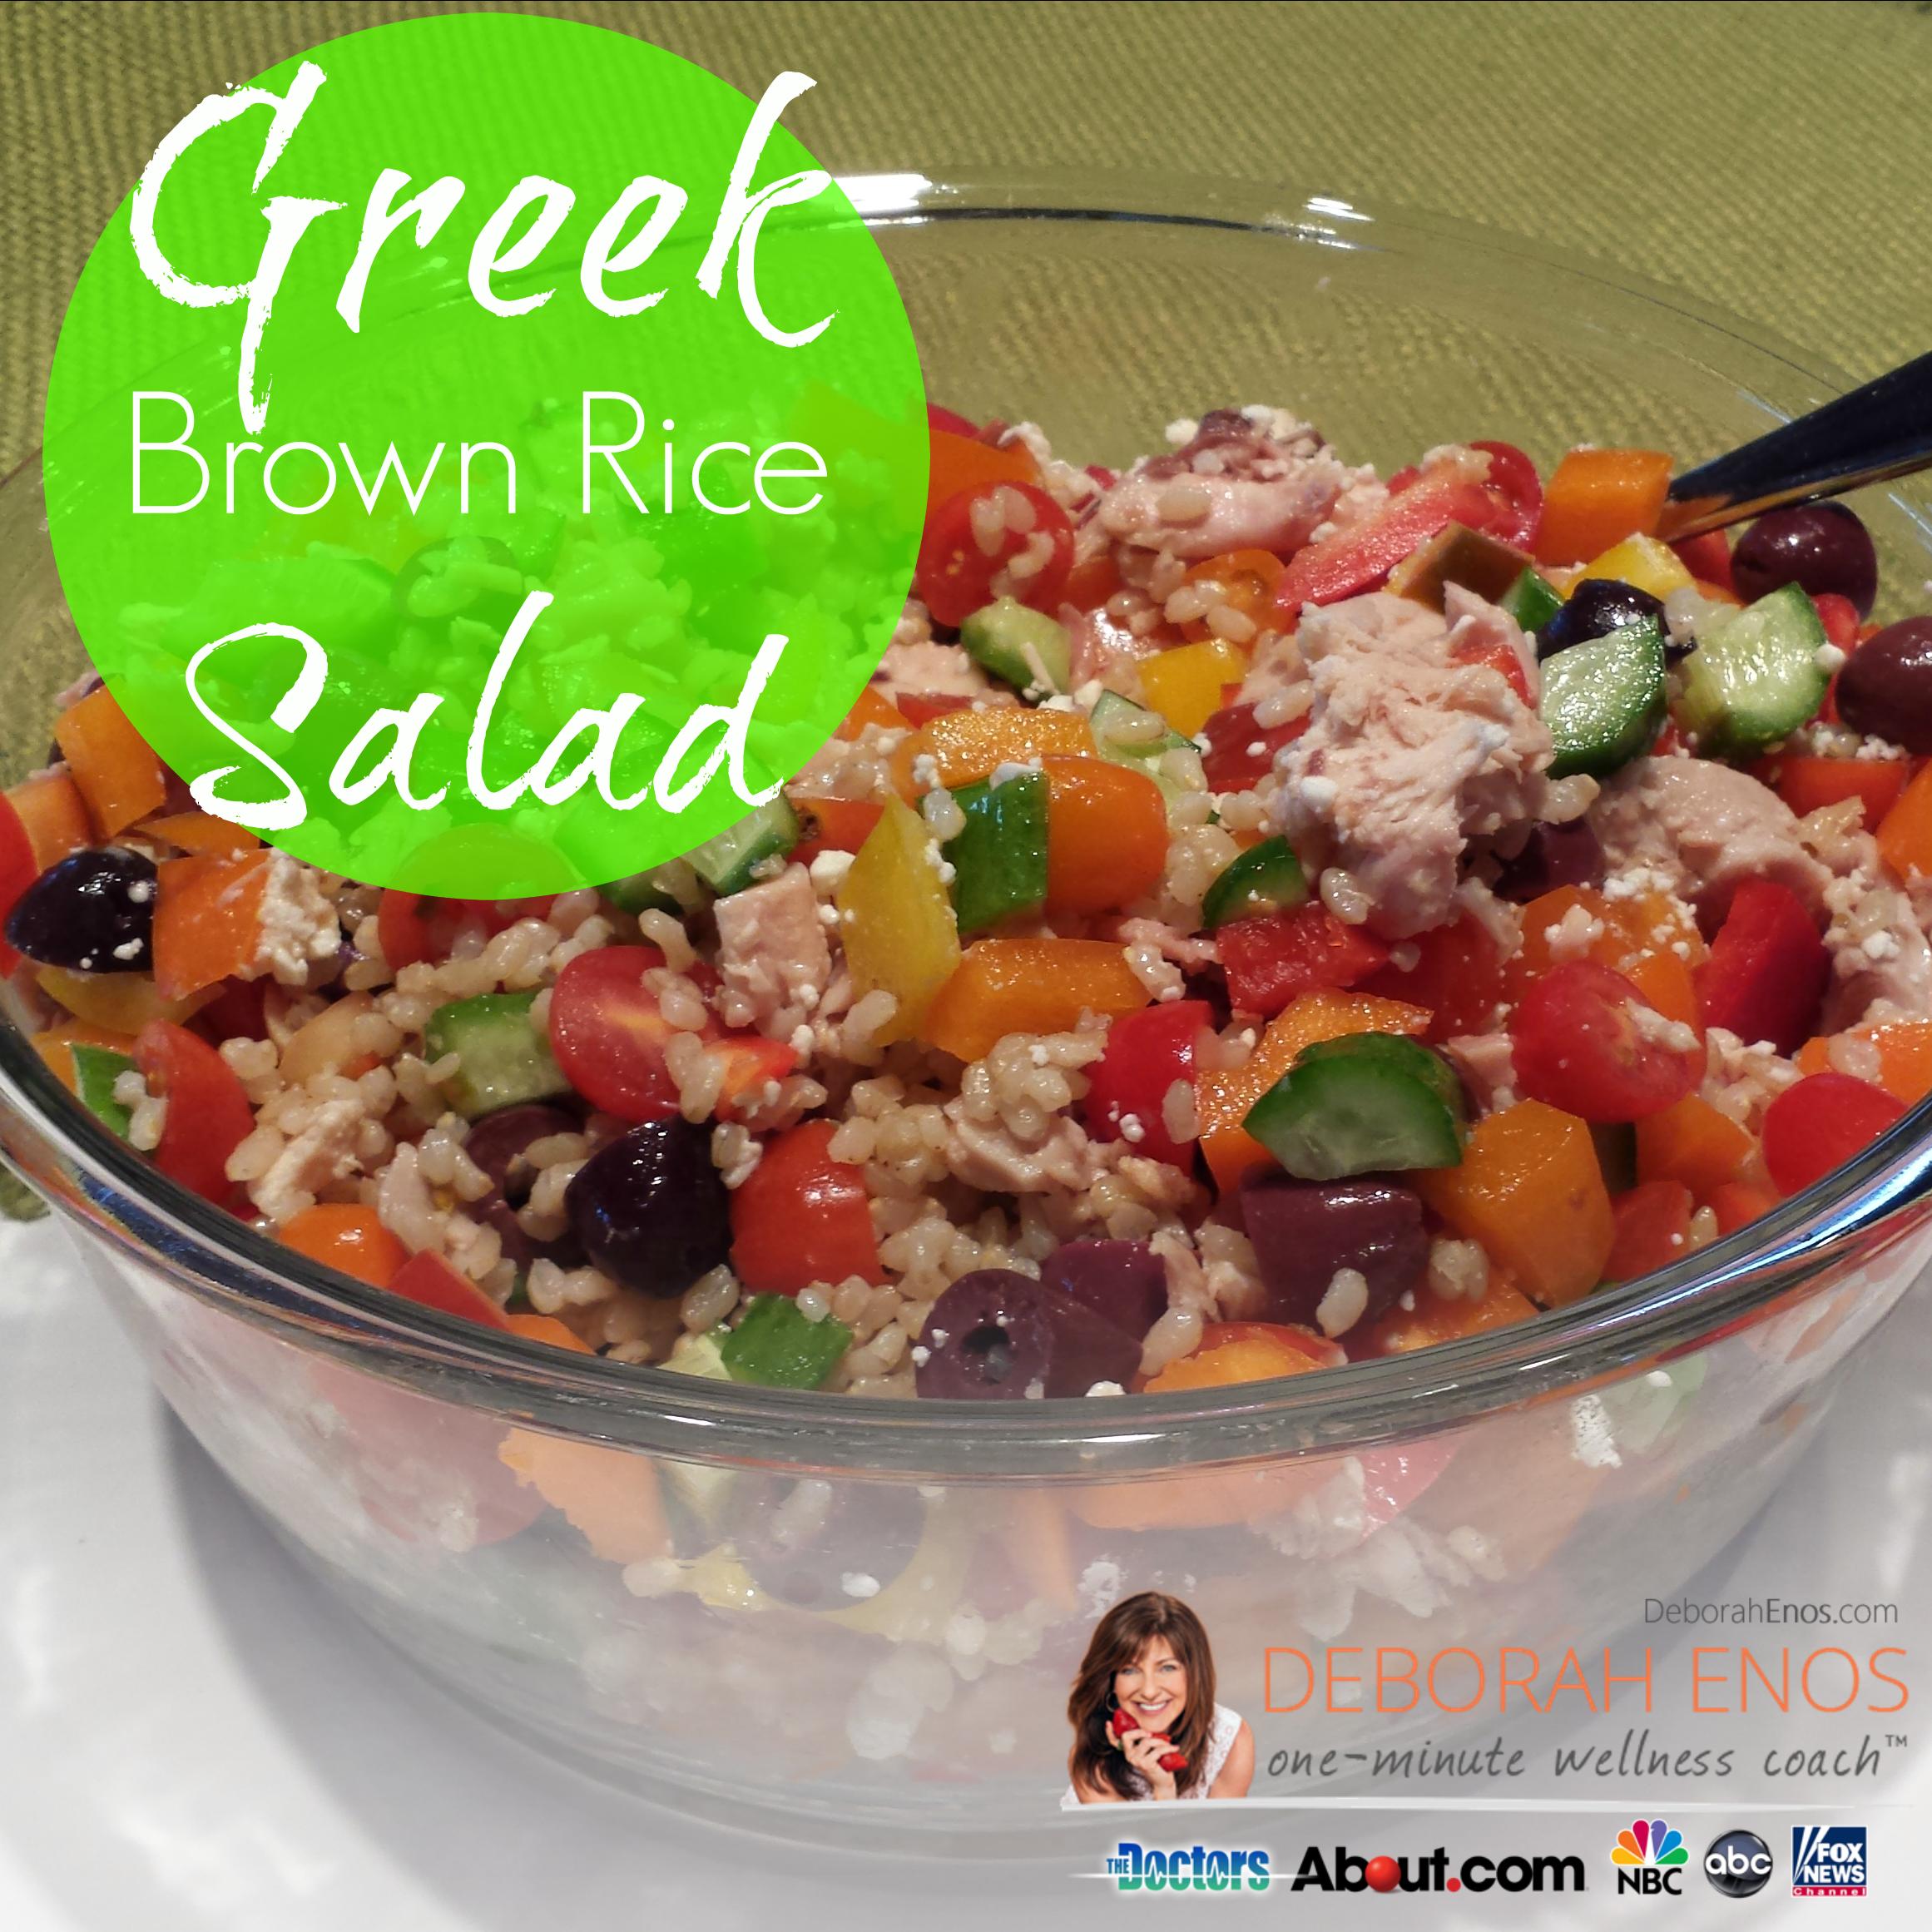 greek brown rice salad recipe